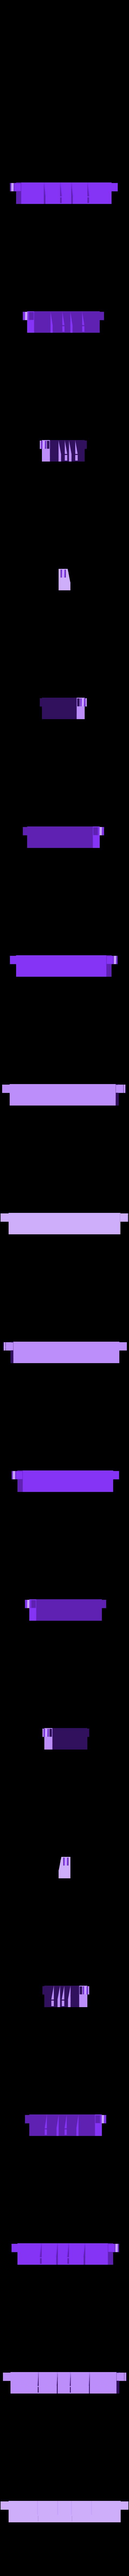 G verin trav AR.STL Download STL file Draisine Matisa for LGB • 3D printable object, biddle